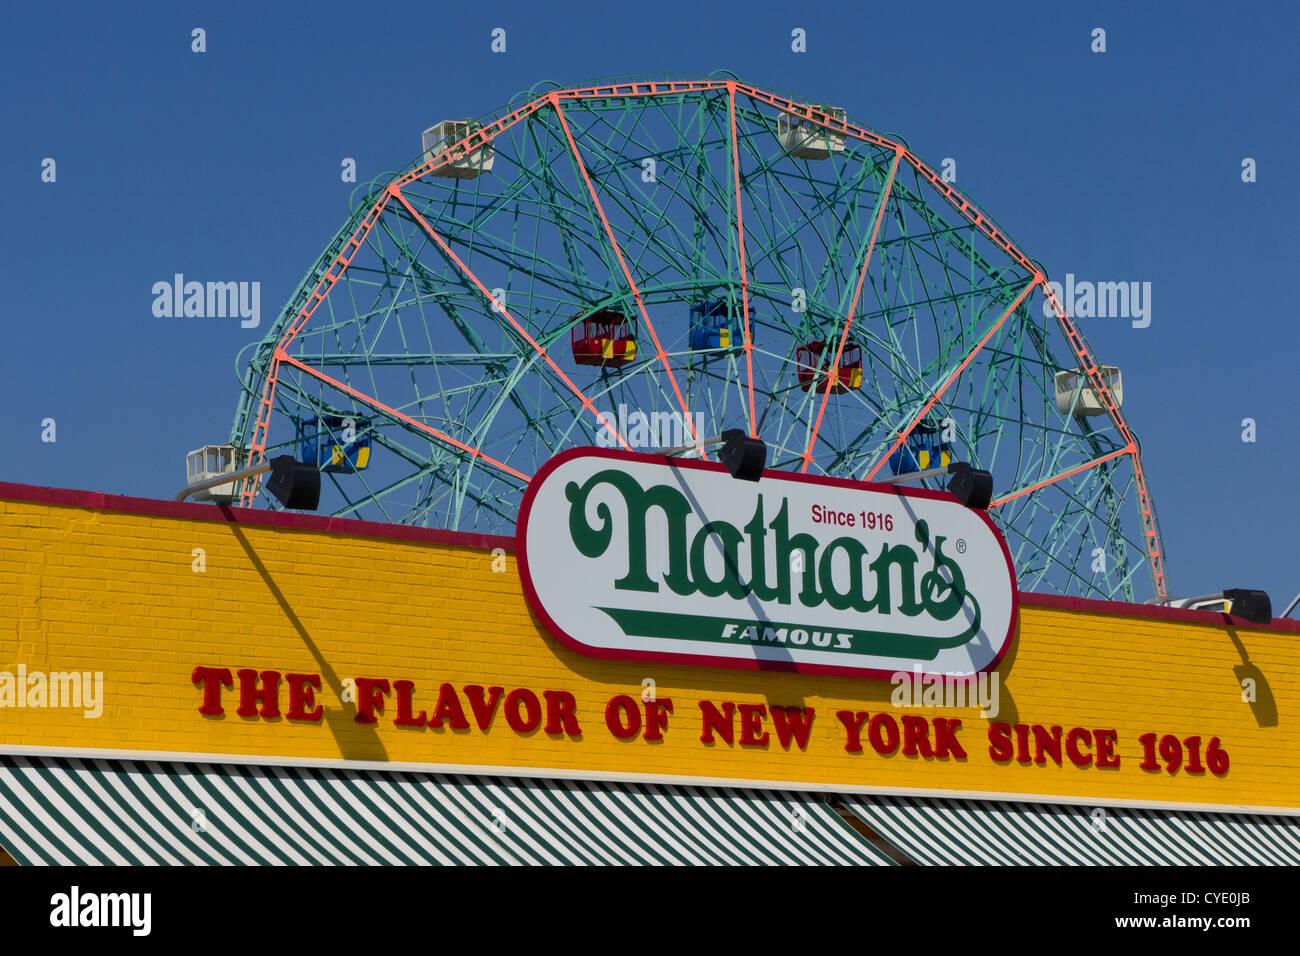 Wonder wheel in Astroland amusement park on Coney Island,with Nathans famous hot dog restaurant New York,New York,United - Stock Image